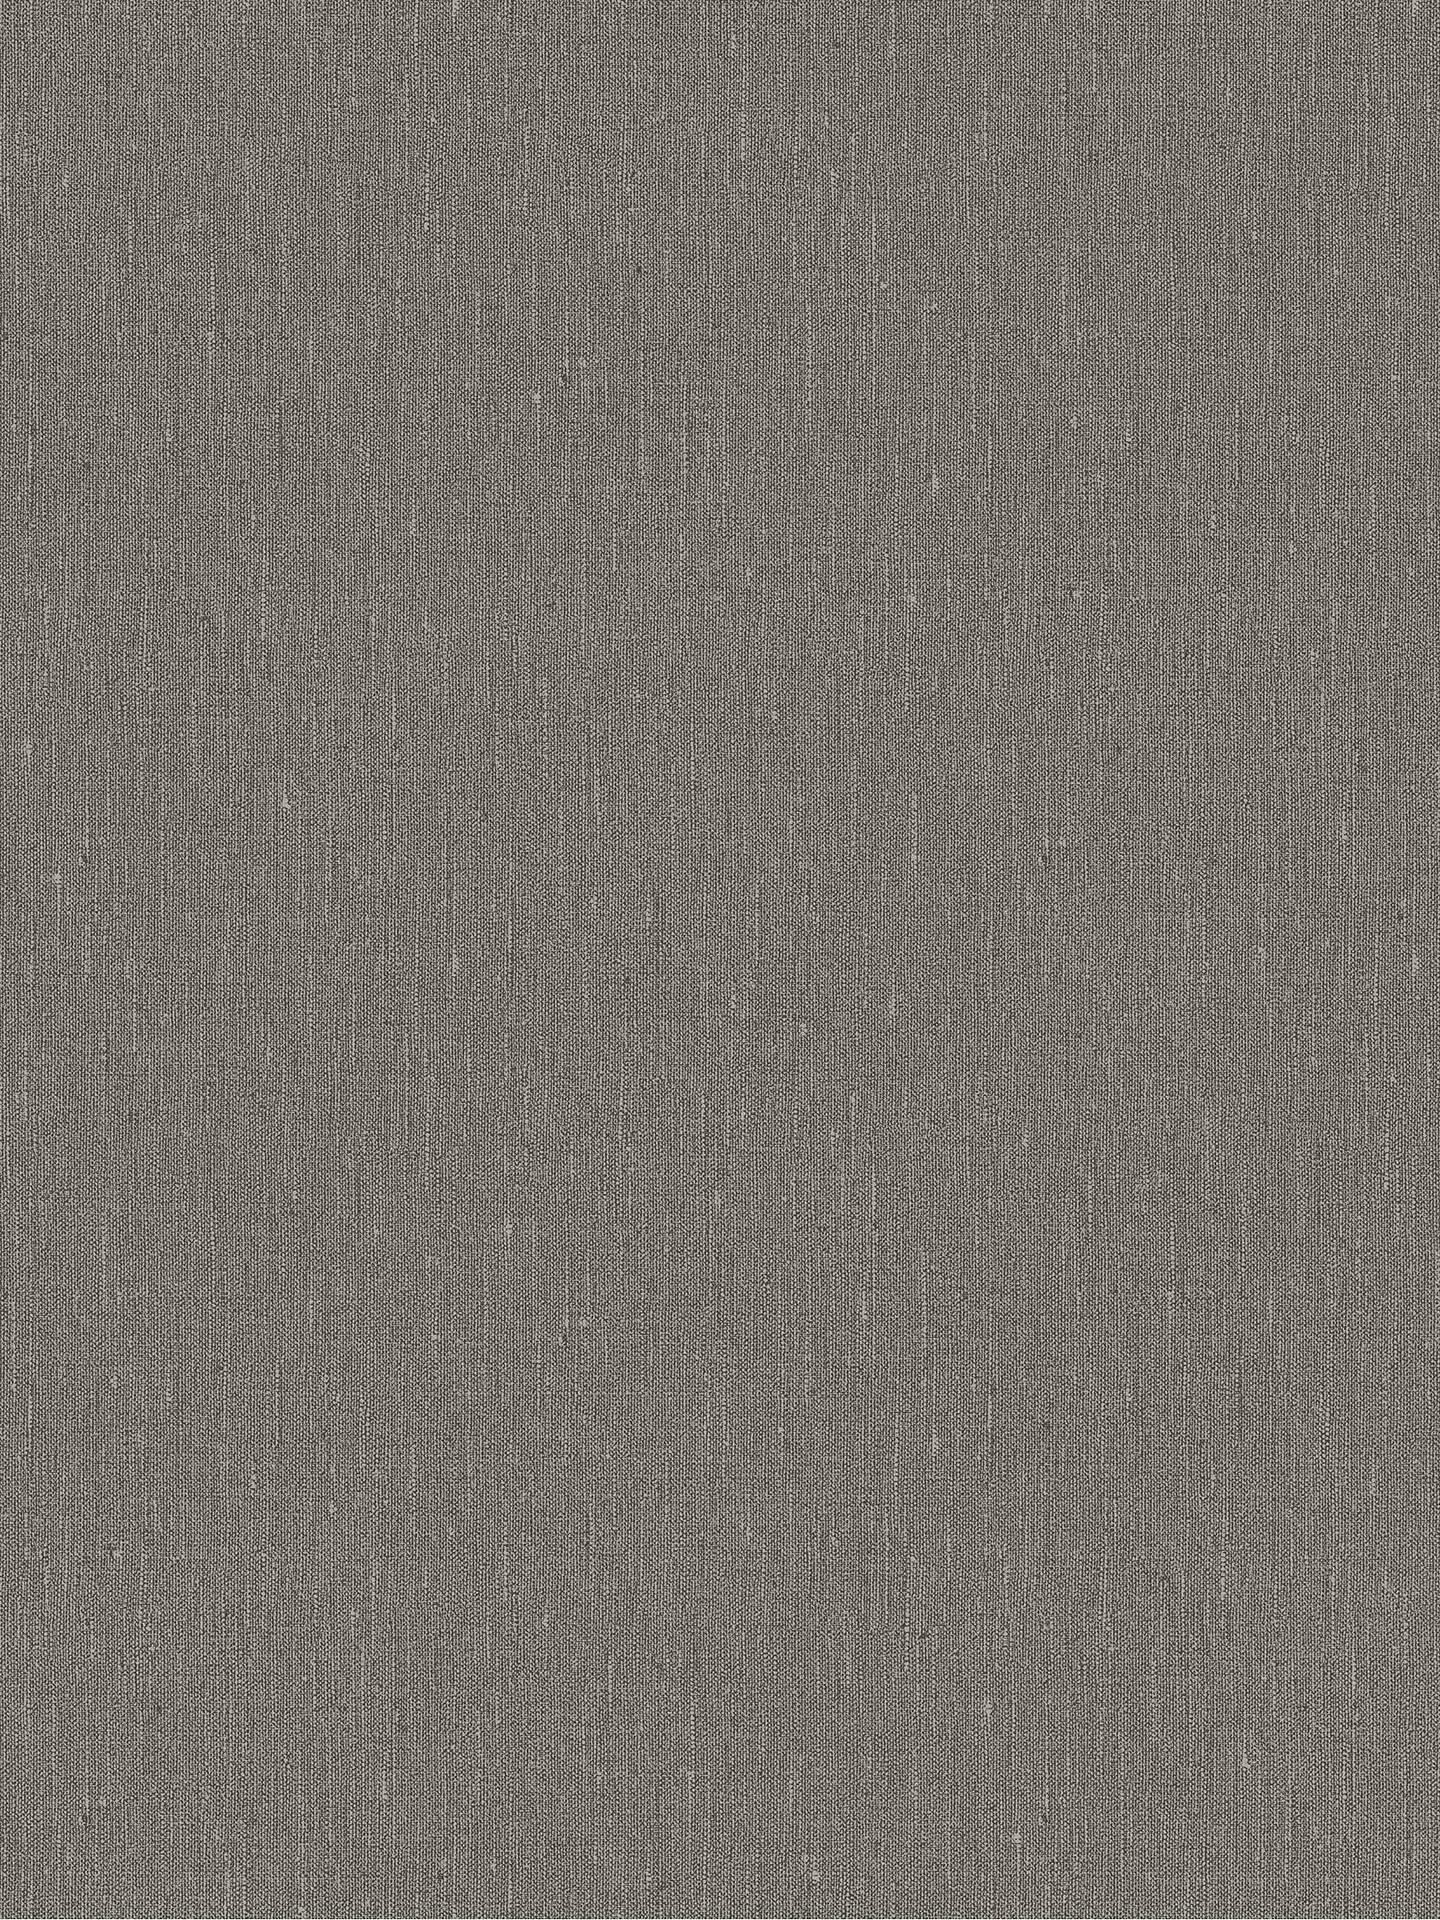 Boråstapeter Plain Textured Wallpaper at John Lewis & Partners